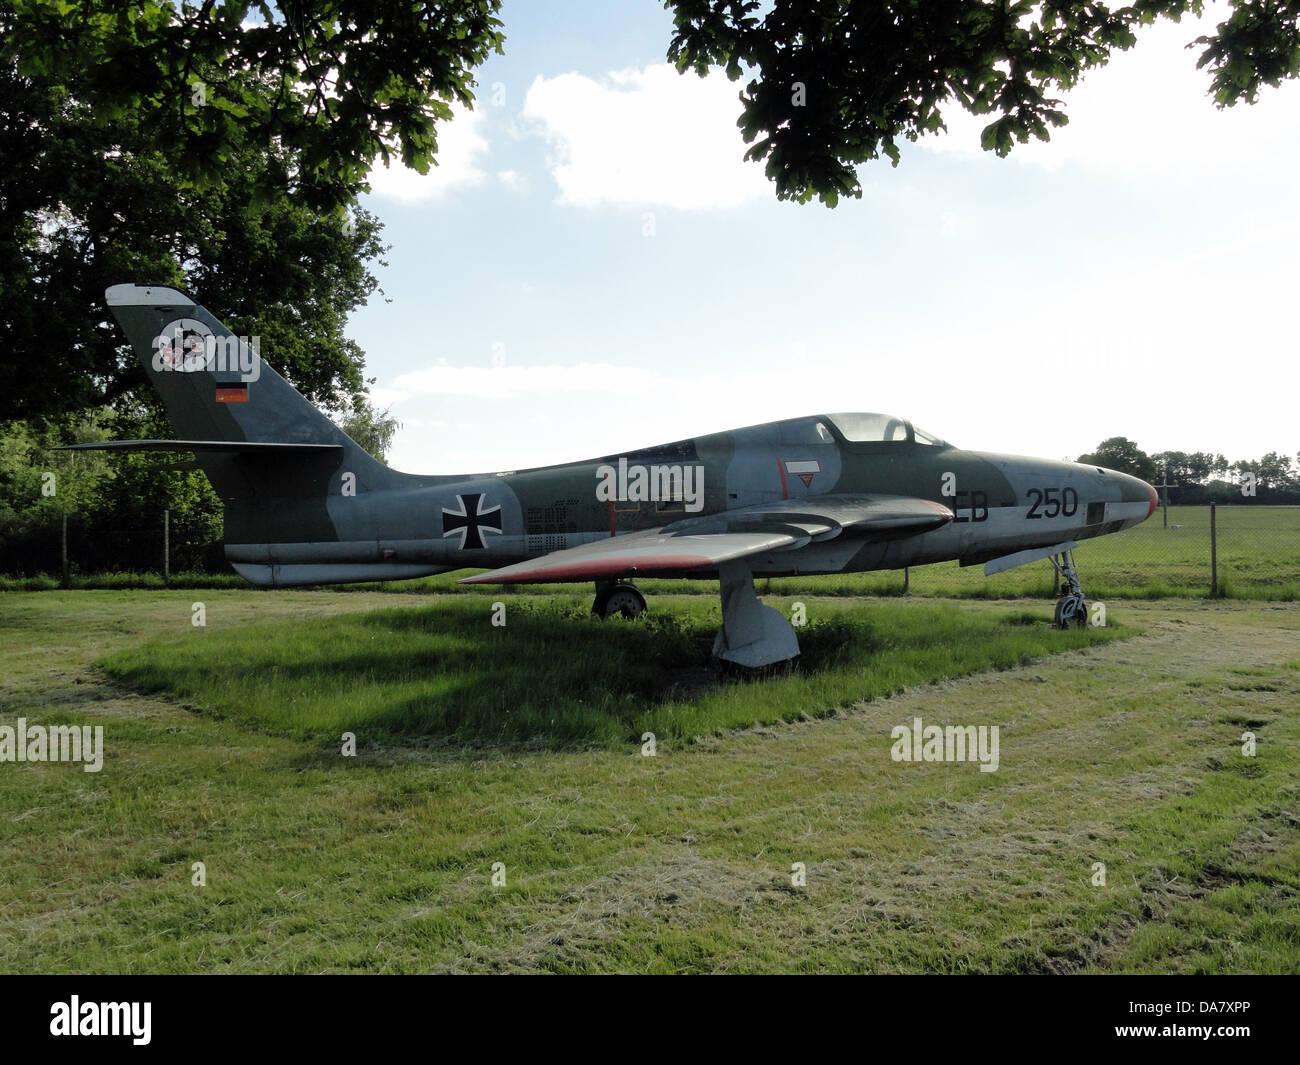 RF-84 F Thunderflash EB-250 at Jagel, 2 - Stock Image